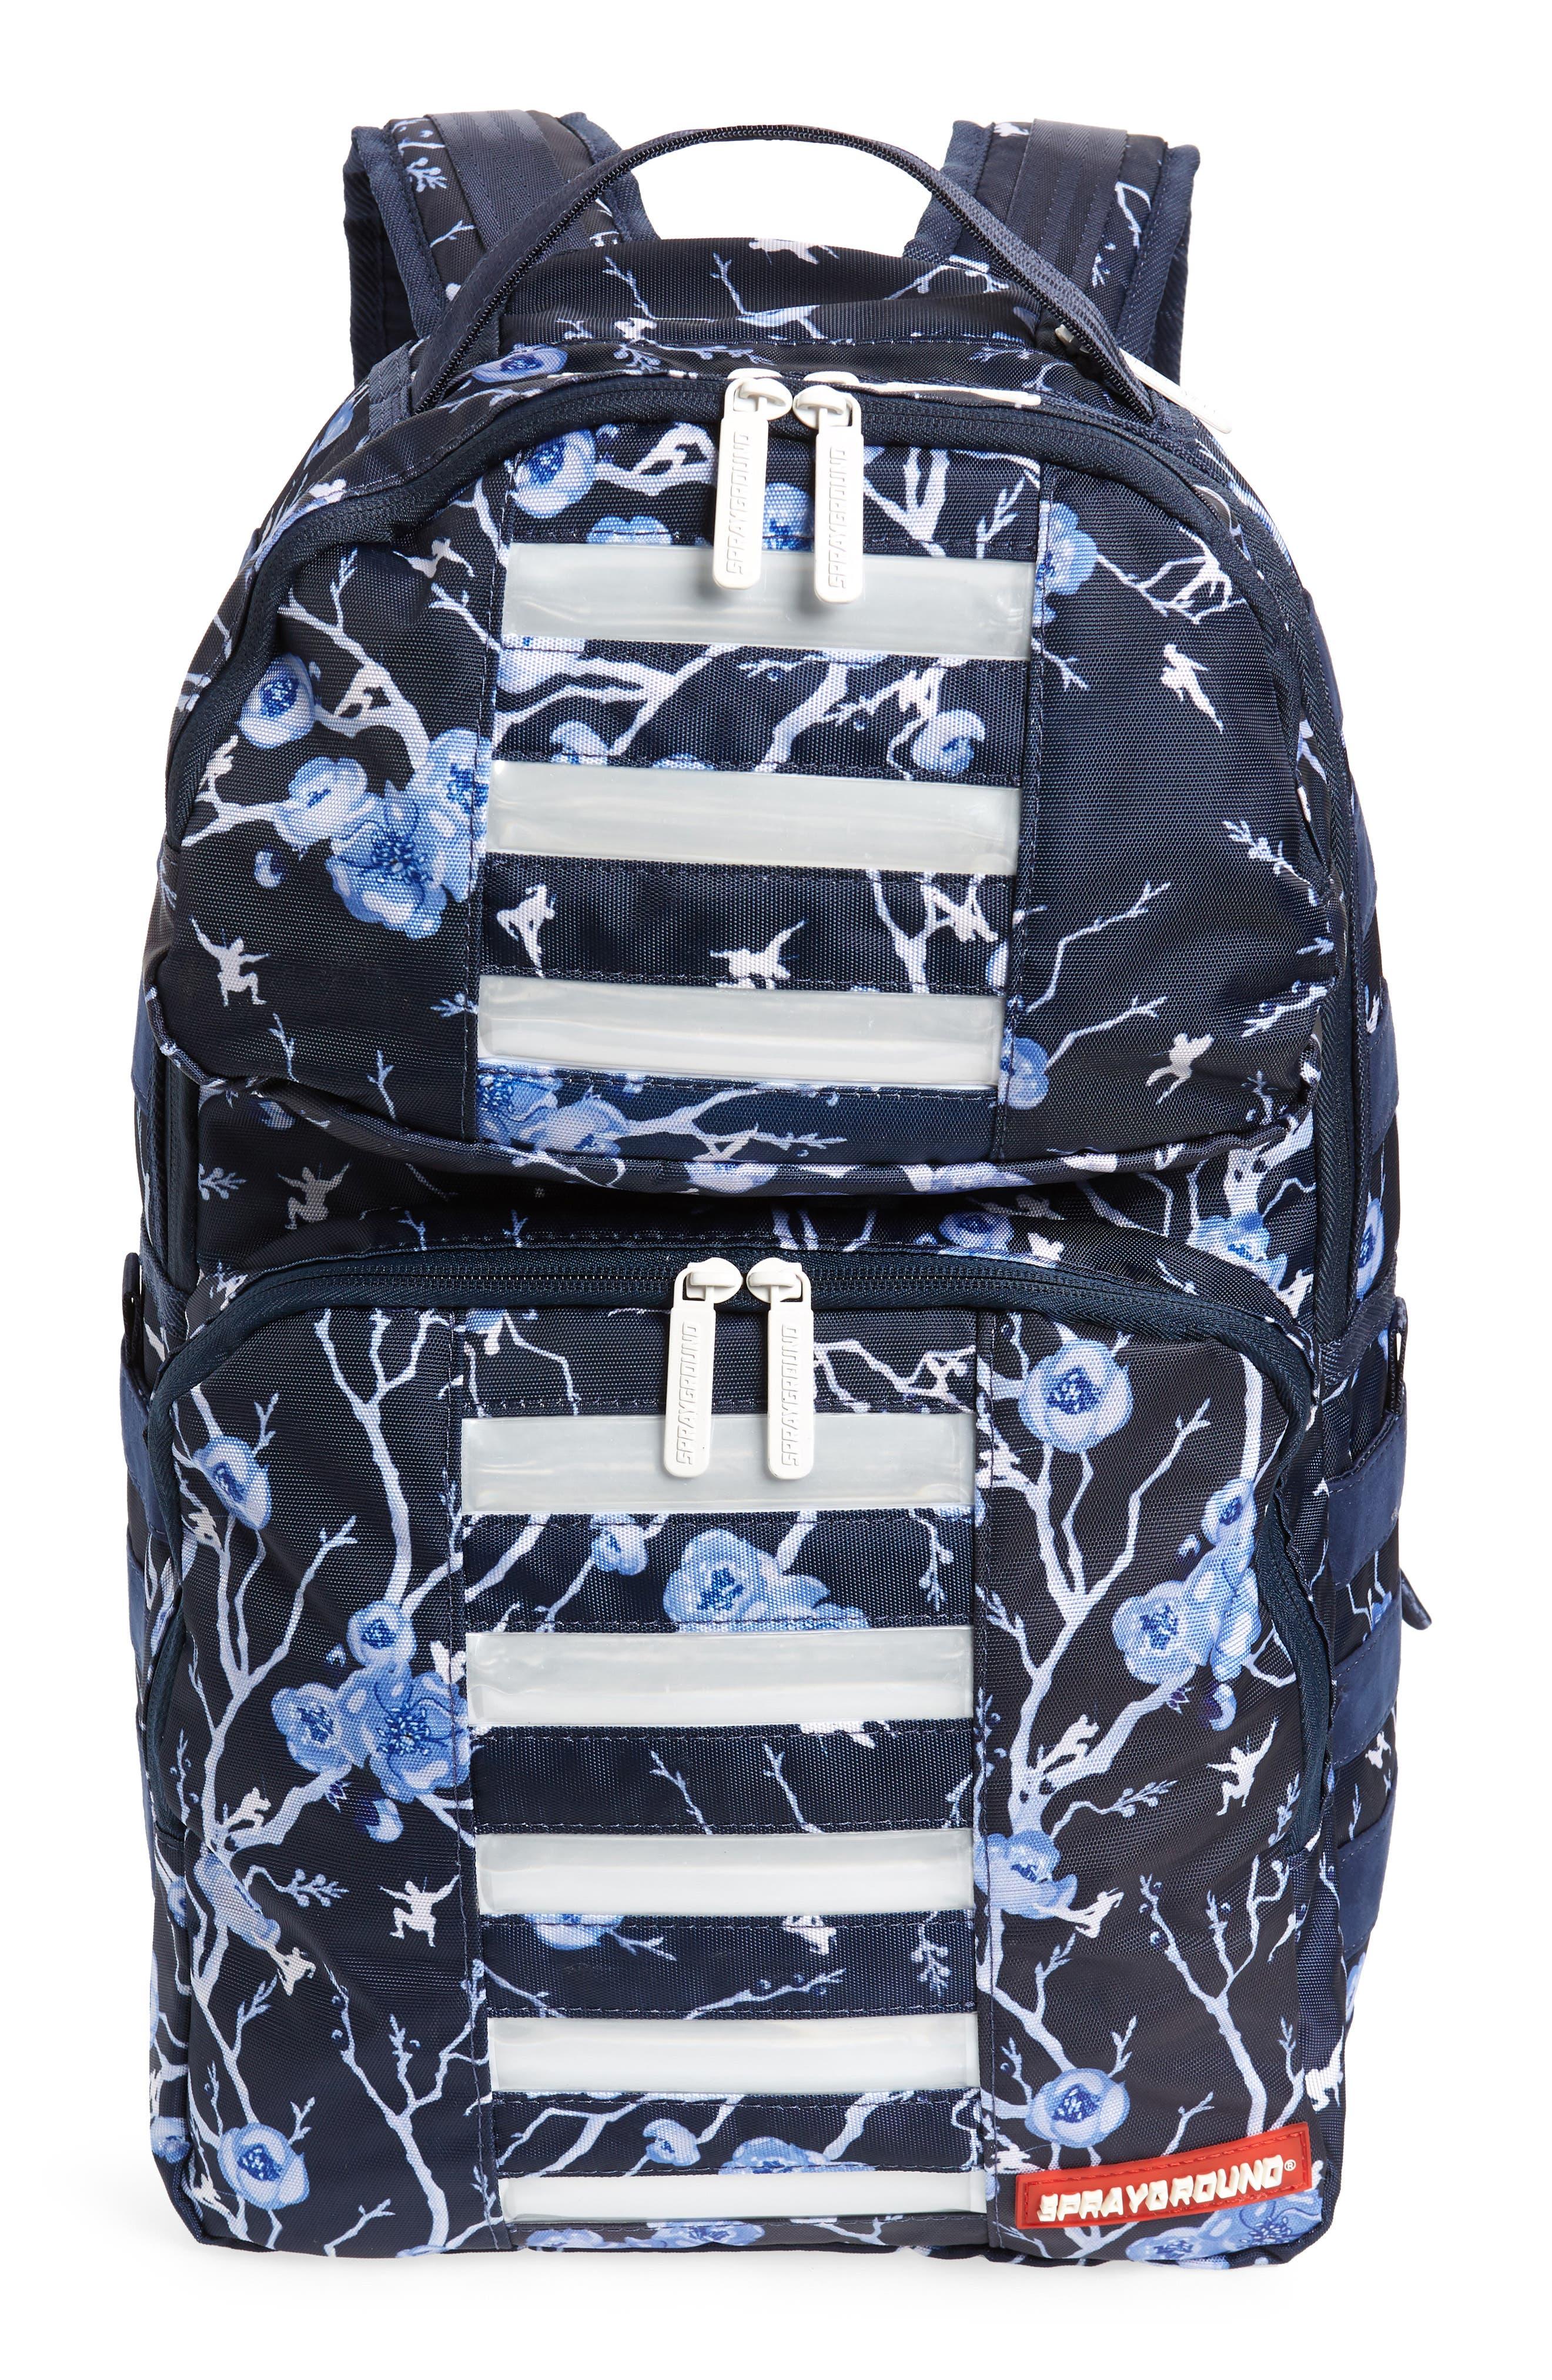 Cherry Blossom LED Backpack,                         Main,                         color, CHERRY BLOSSOM